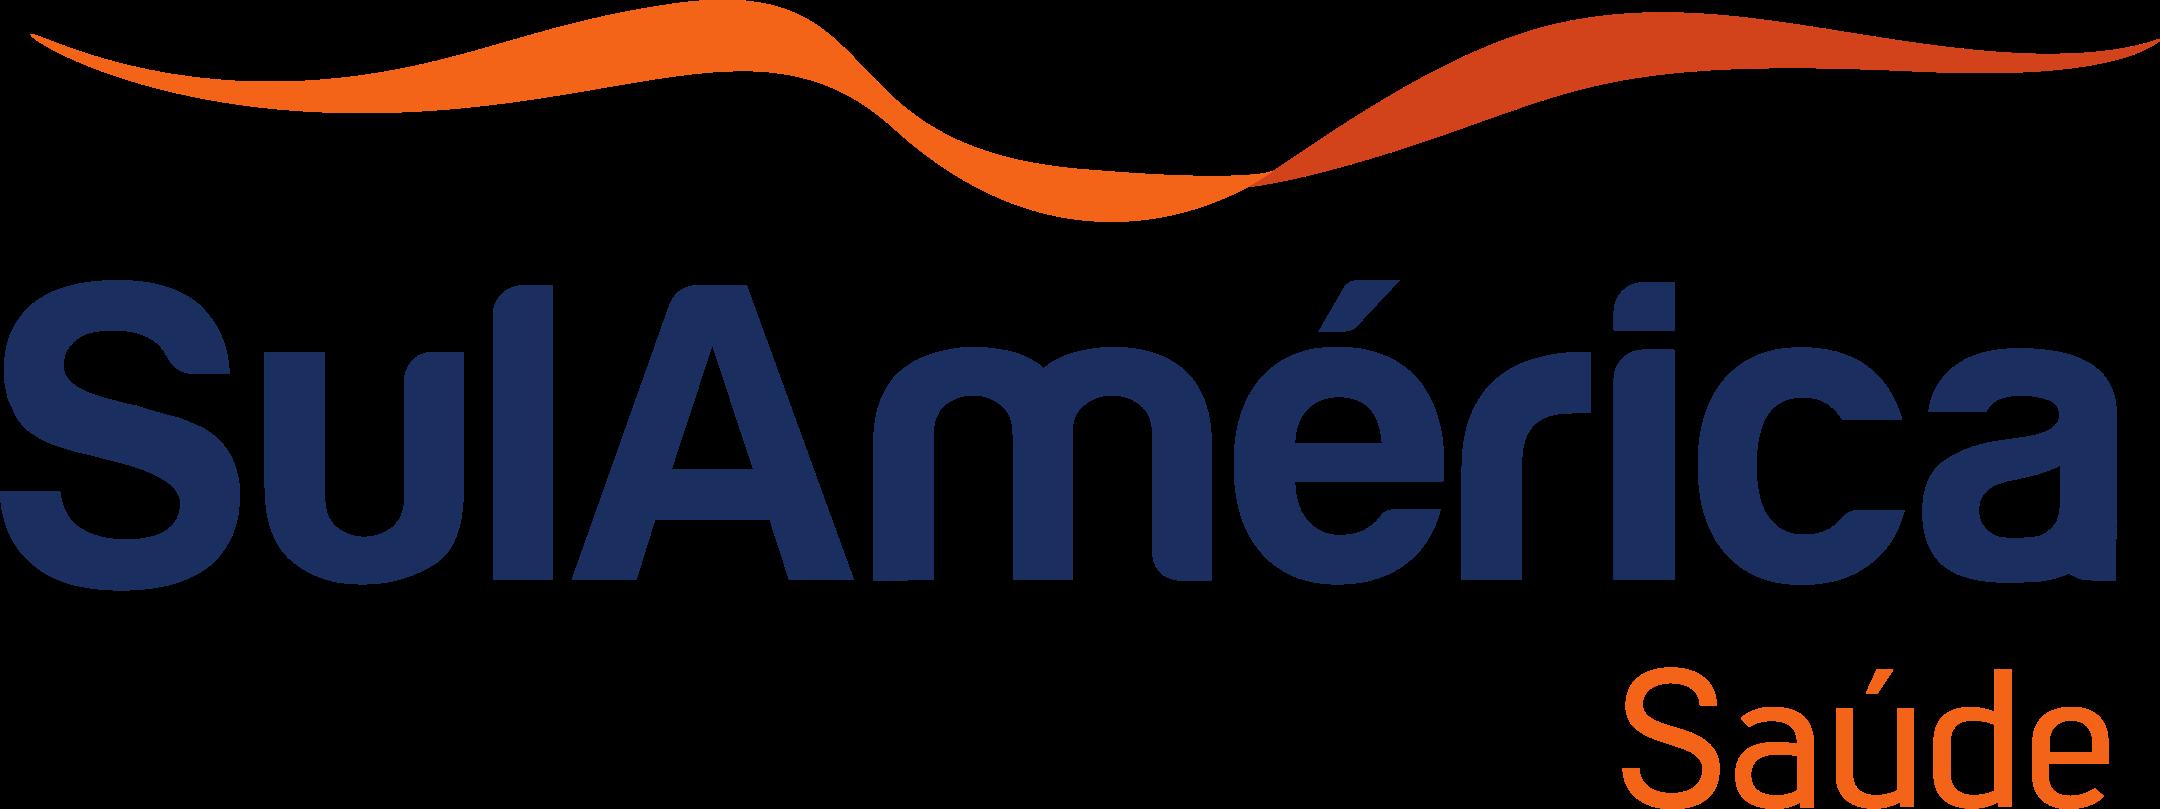 sulamerica saude logo 1 - SulAmérica Saúde Logo